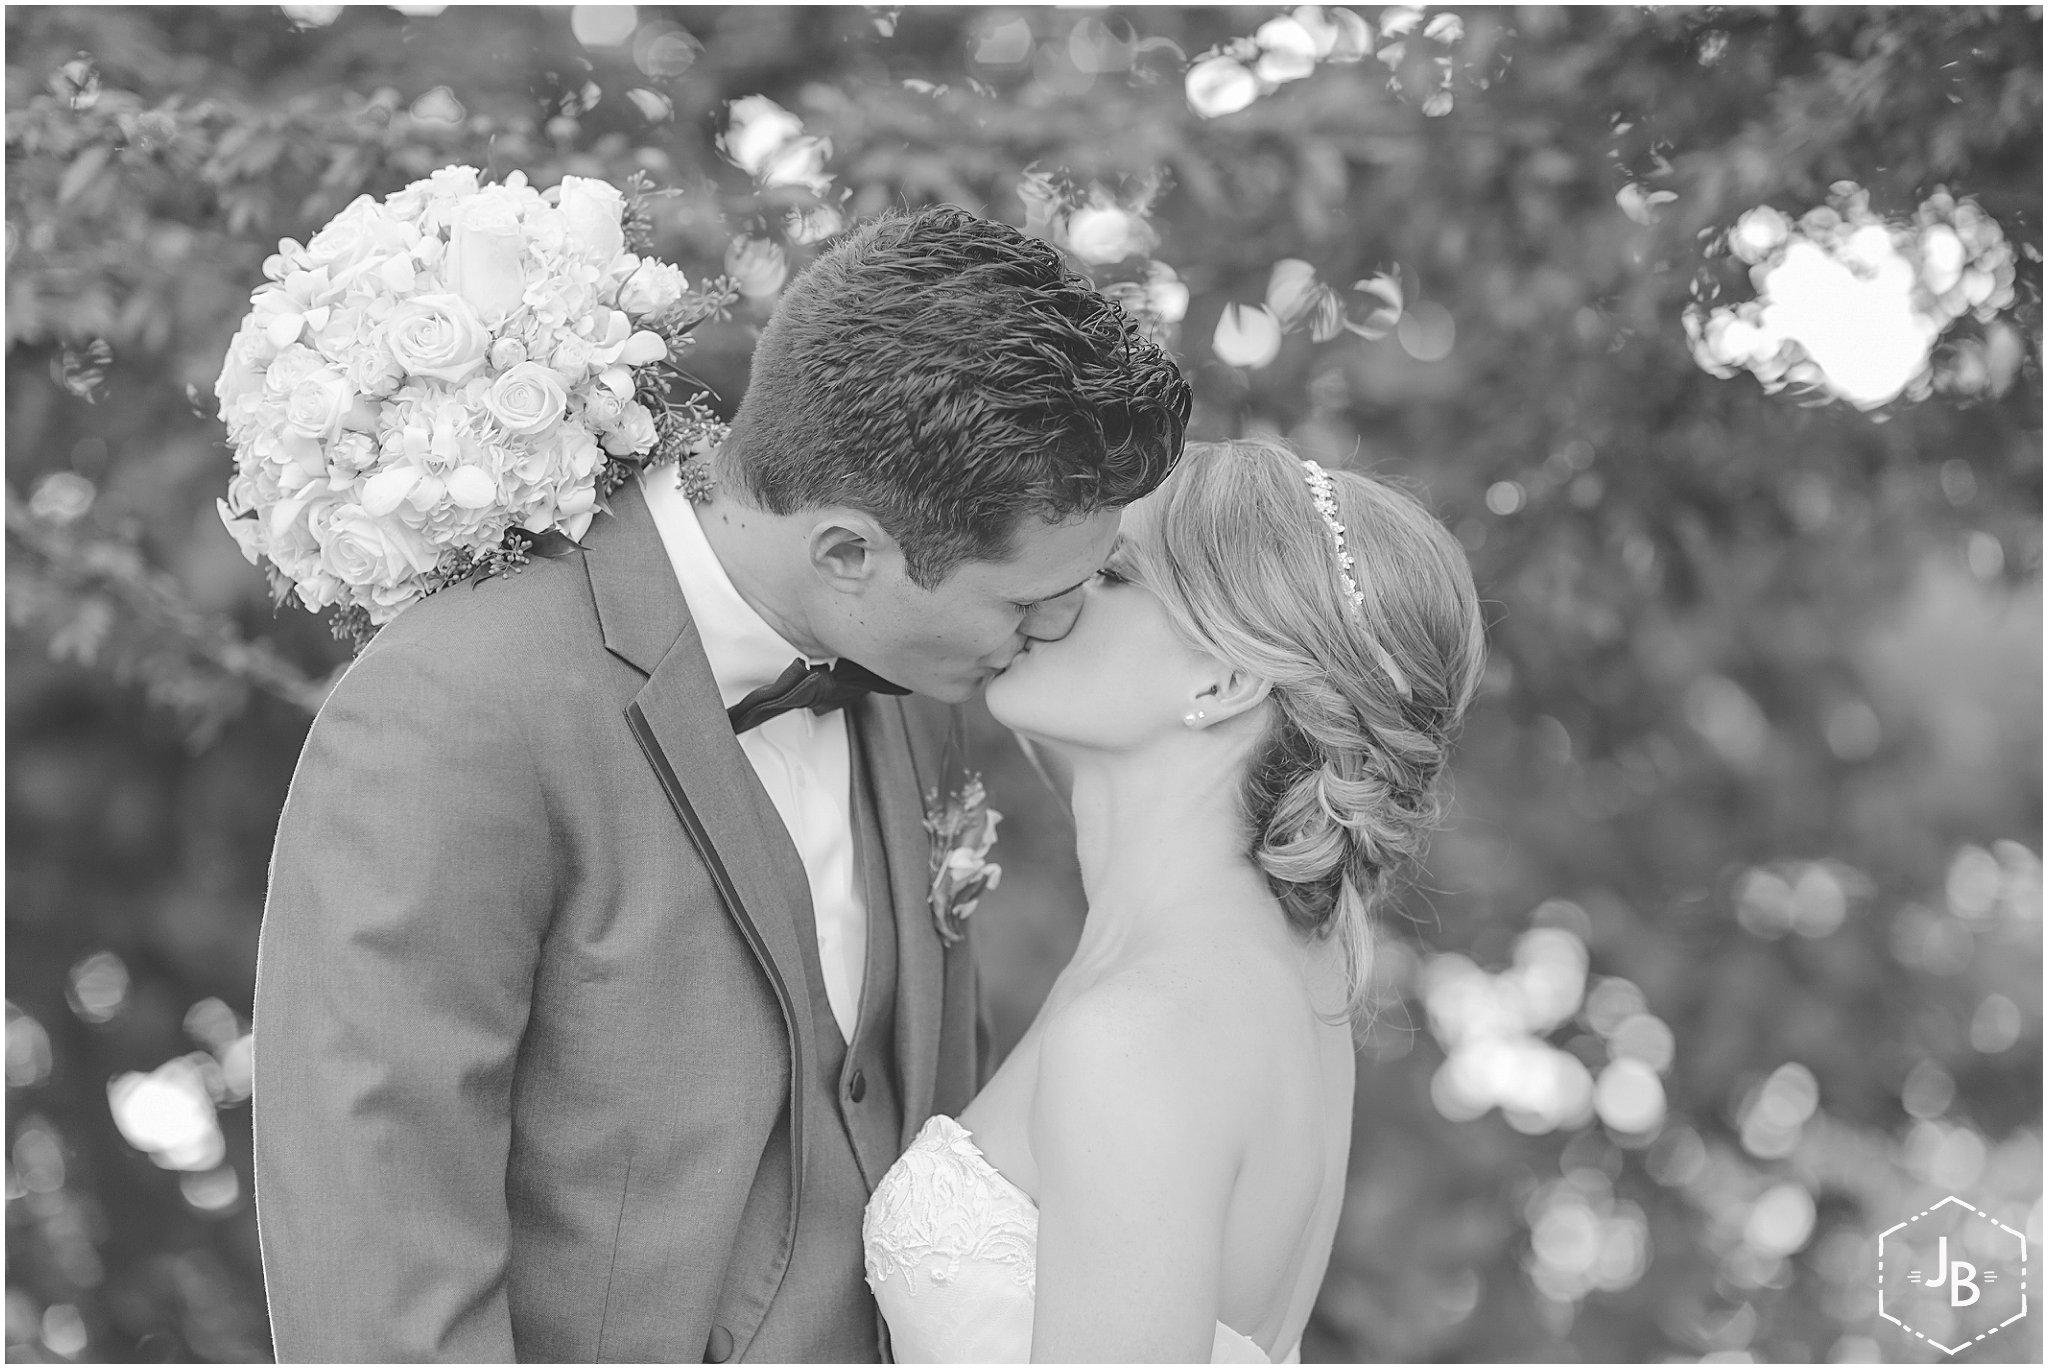 WeddingandEngagementFloridaPhotographer_0363.jpg